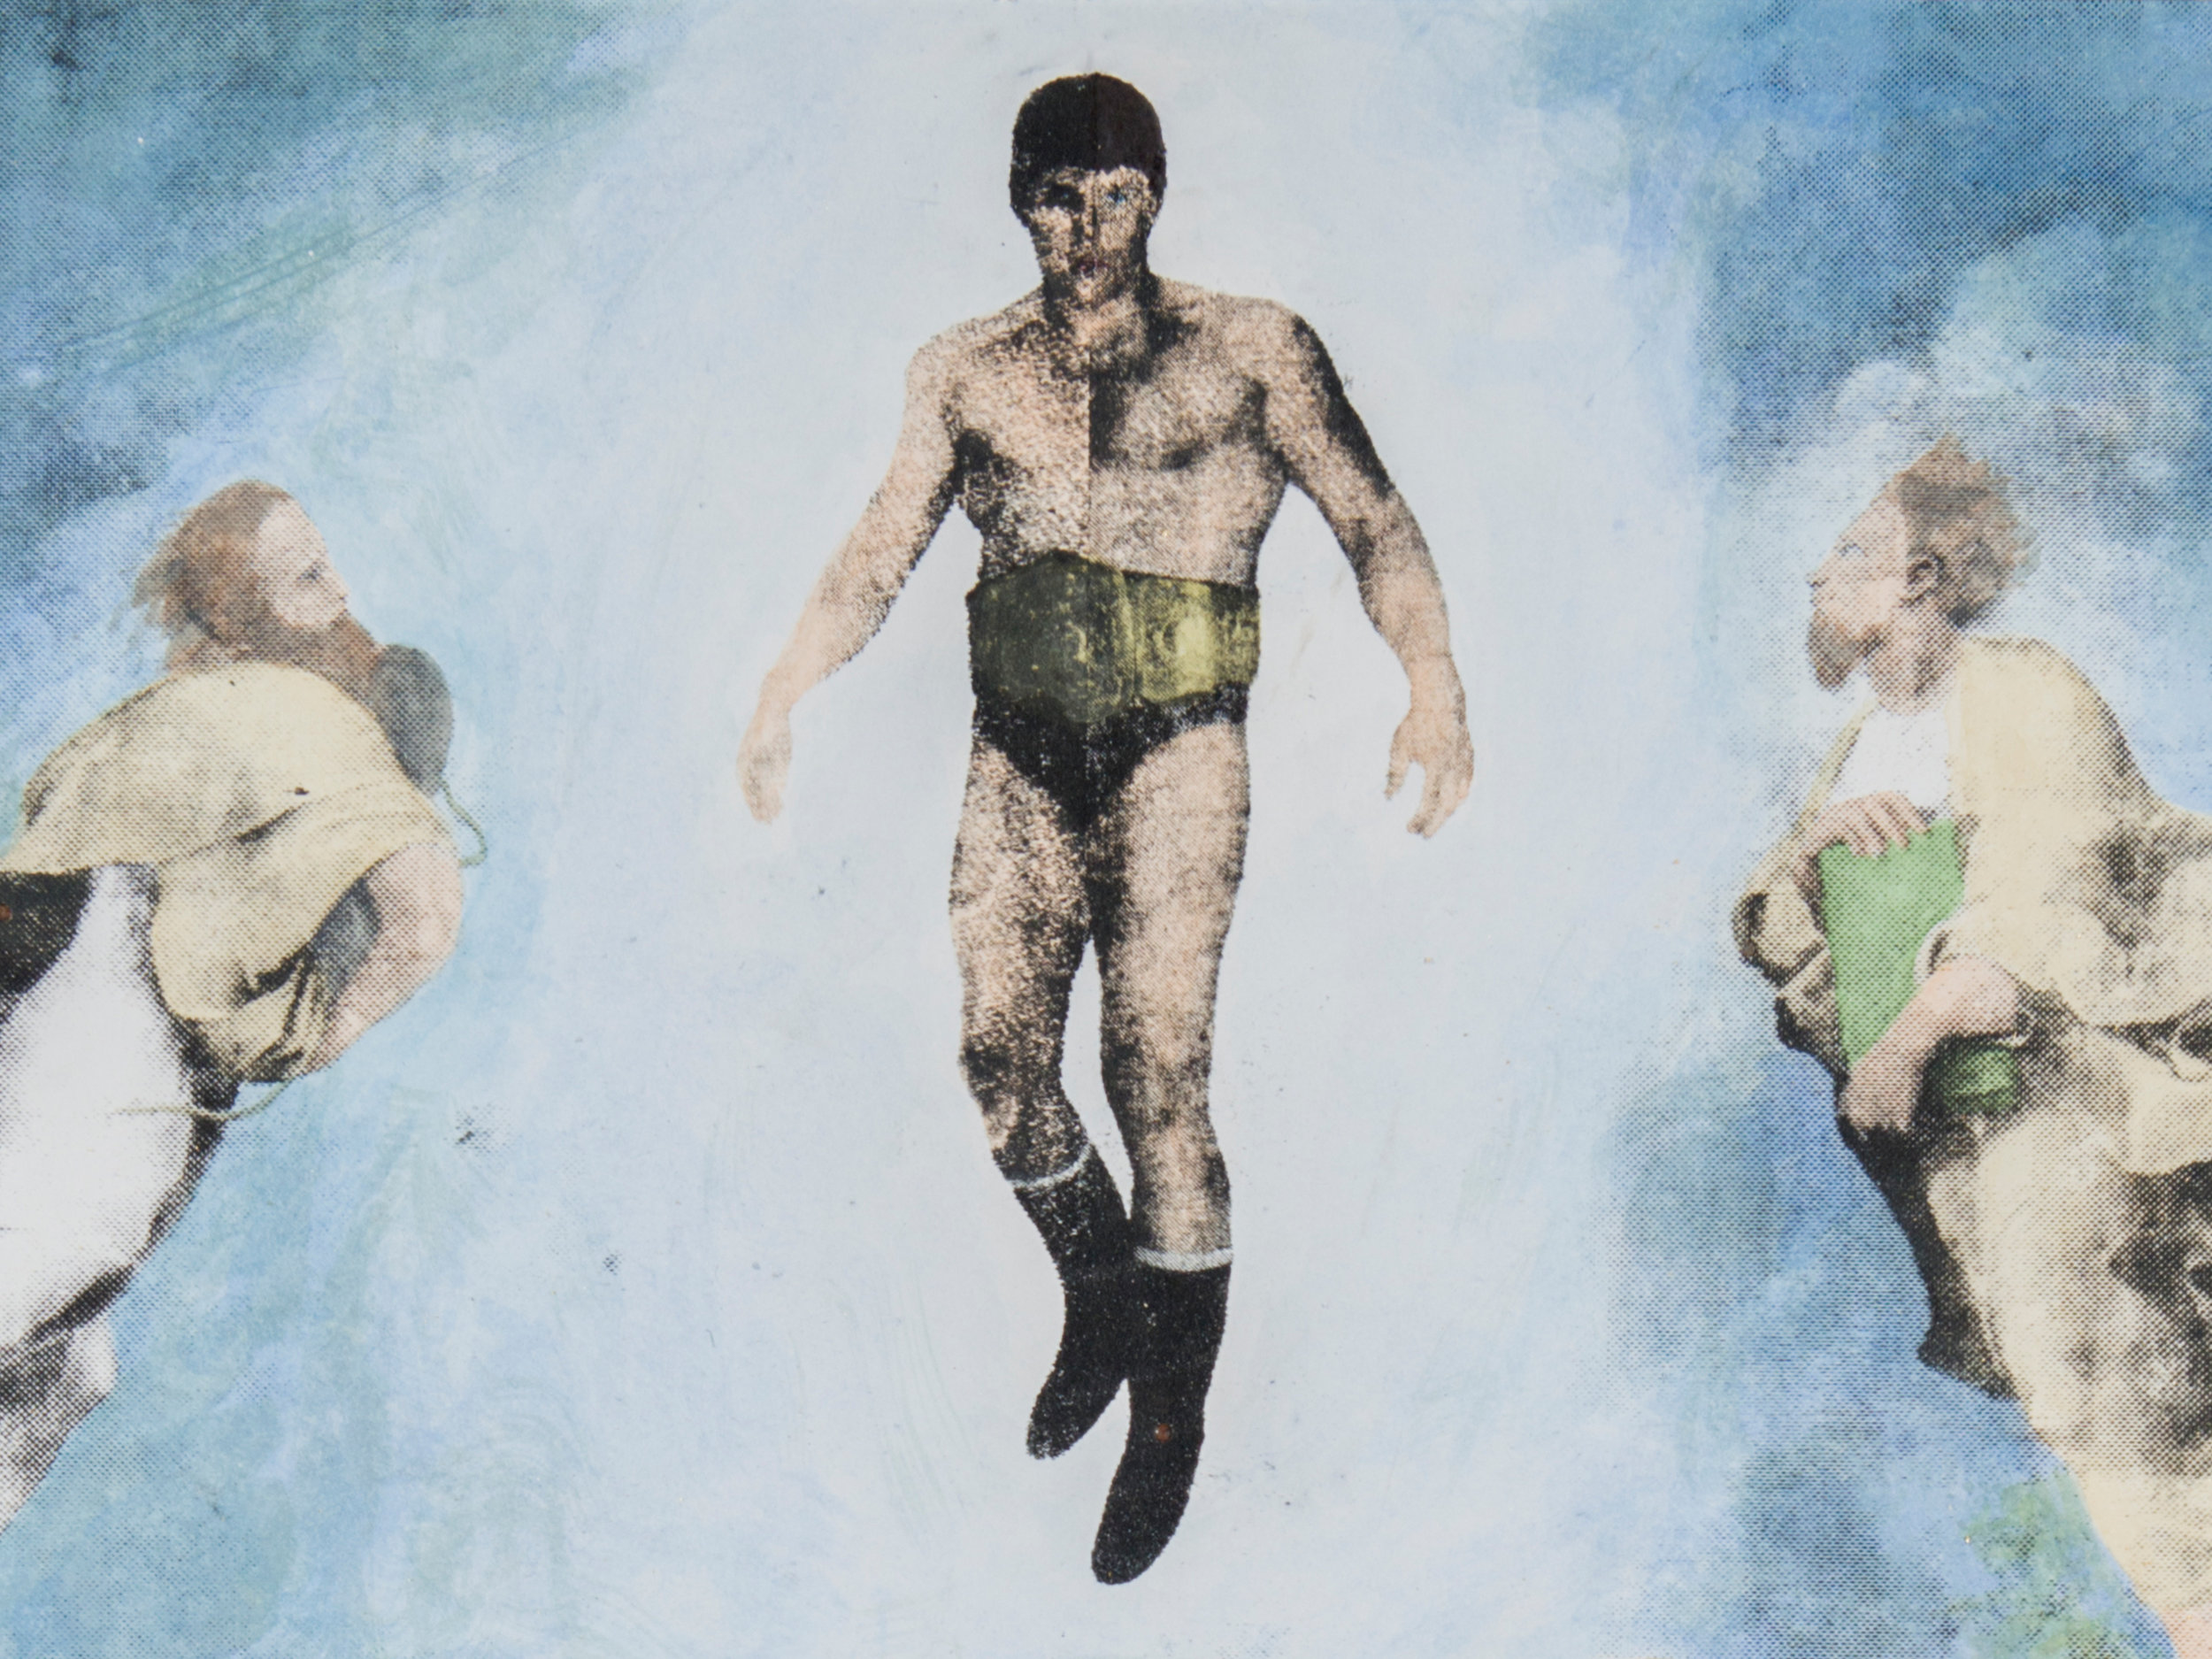 "SOLD - La transfiguration de Leo Burke, 2015-2017, 18"" x 24"", screenprint and watercolour on paper, edition of 1, 200CAD"